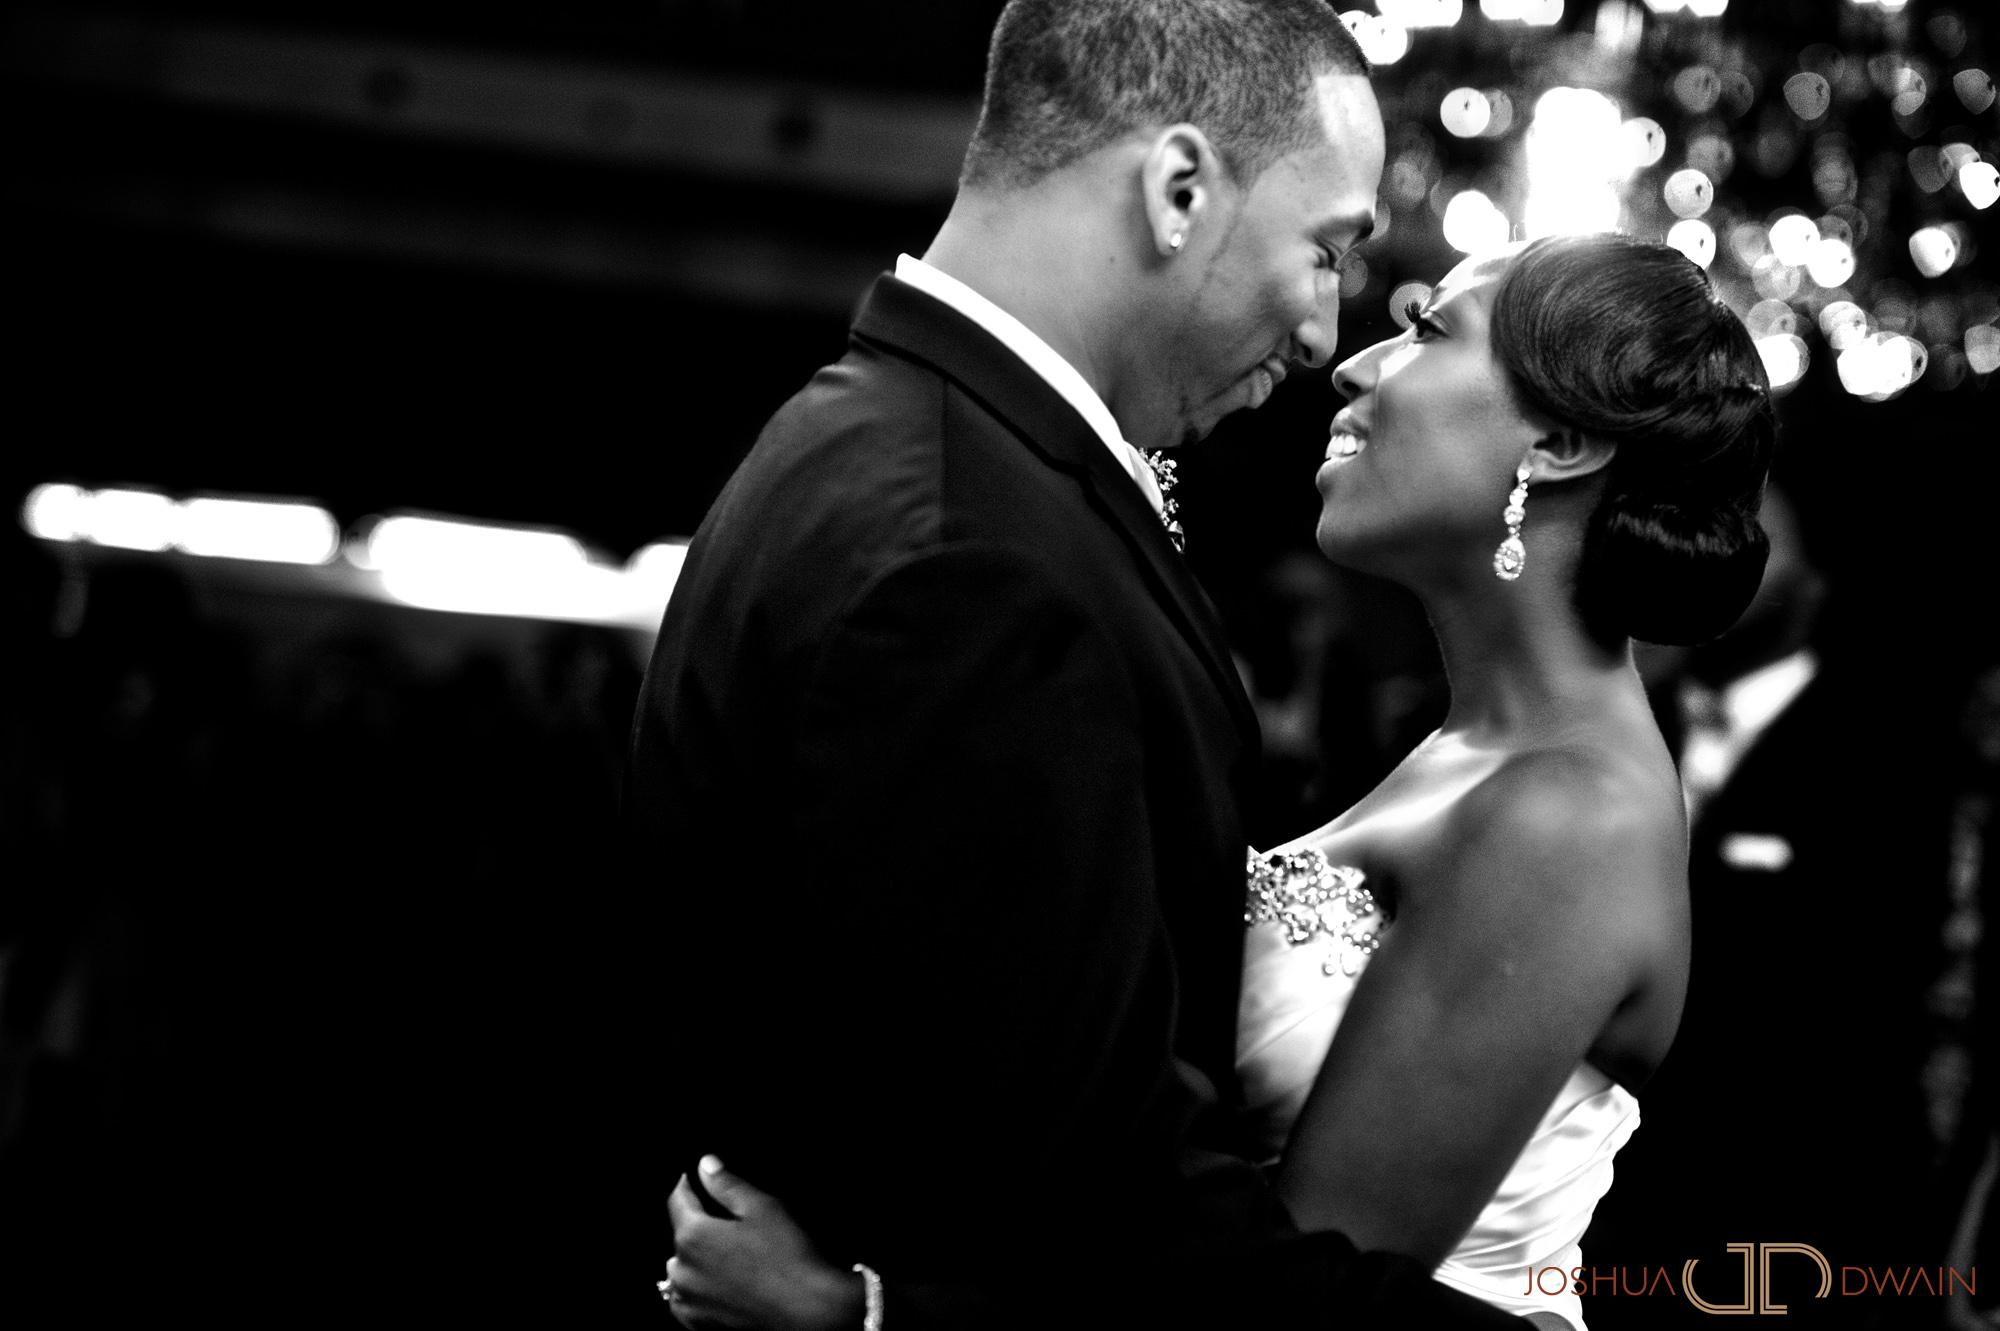 cherisse-stefan-016-russos-on-the-bay-new-york-citywedding-photographer-joshua-dwain-2012-08-24_cs_425